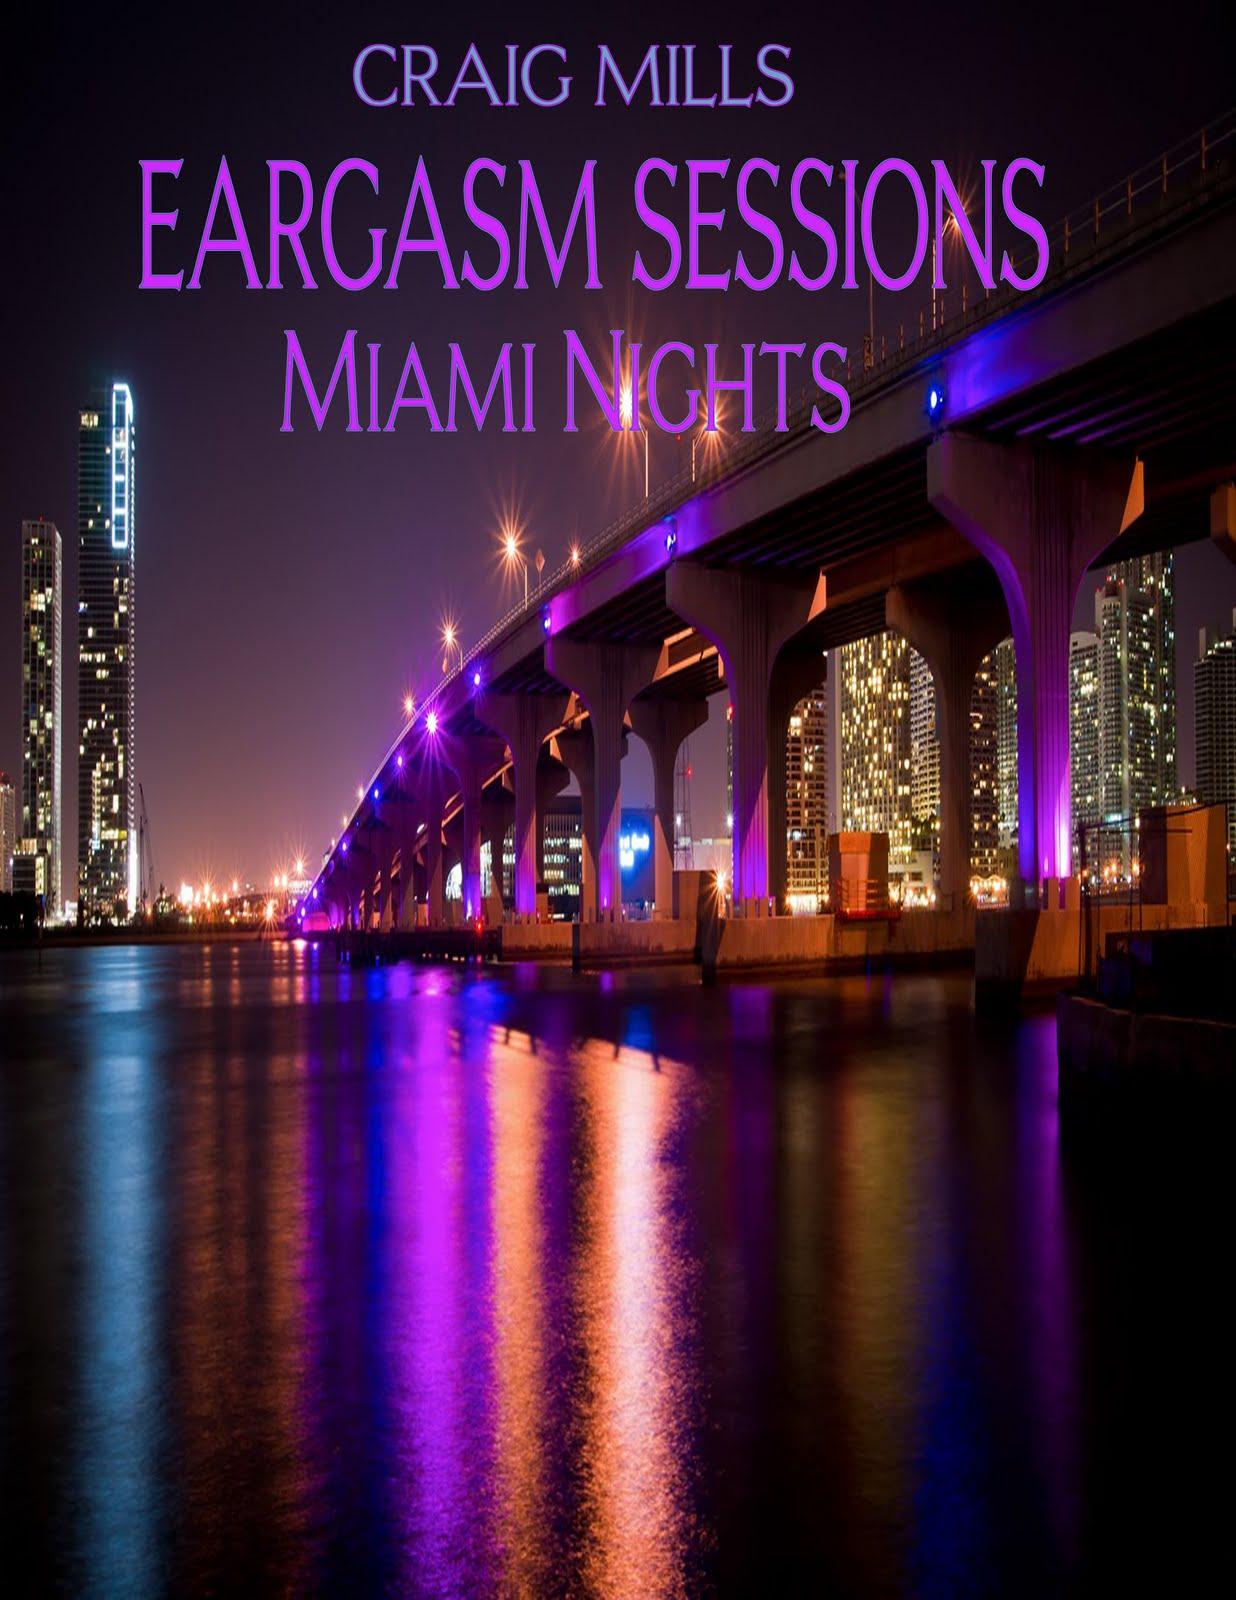 http://4.bp.blogspot.com/-5rGrzRRNAAk/Ti20LcG4wRI/AAAAAAAAAP0/-vH0Bj-M1UY/s1600/MiamiNights.jpg